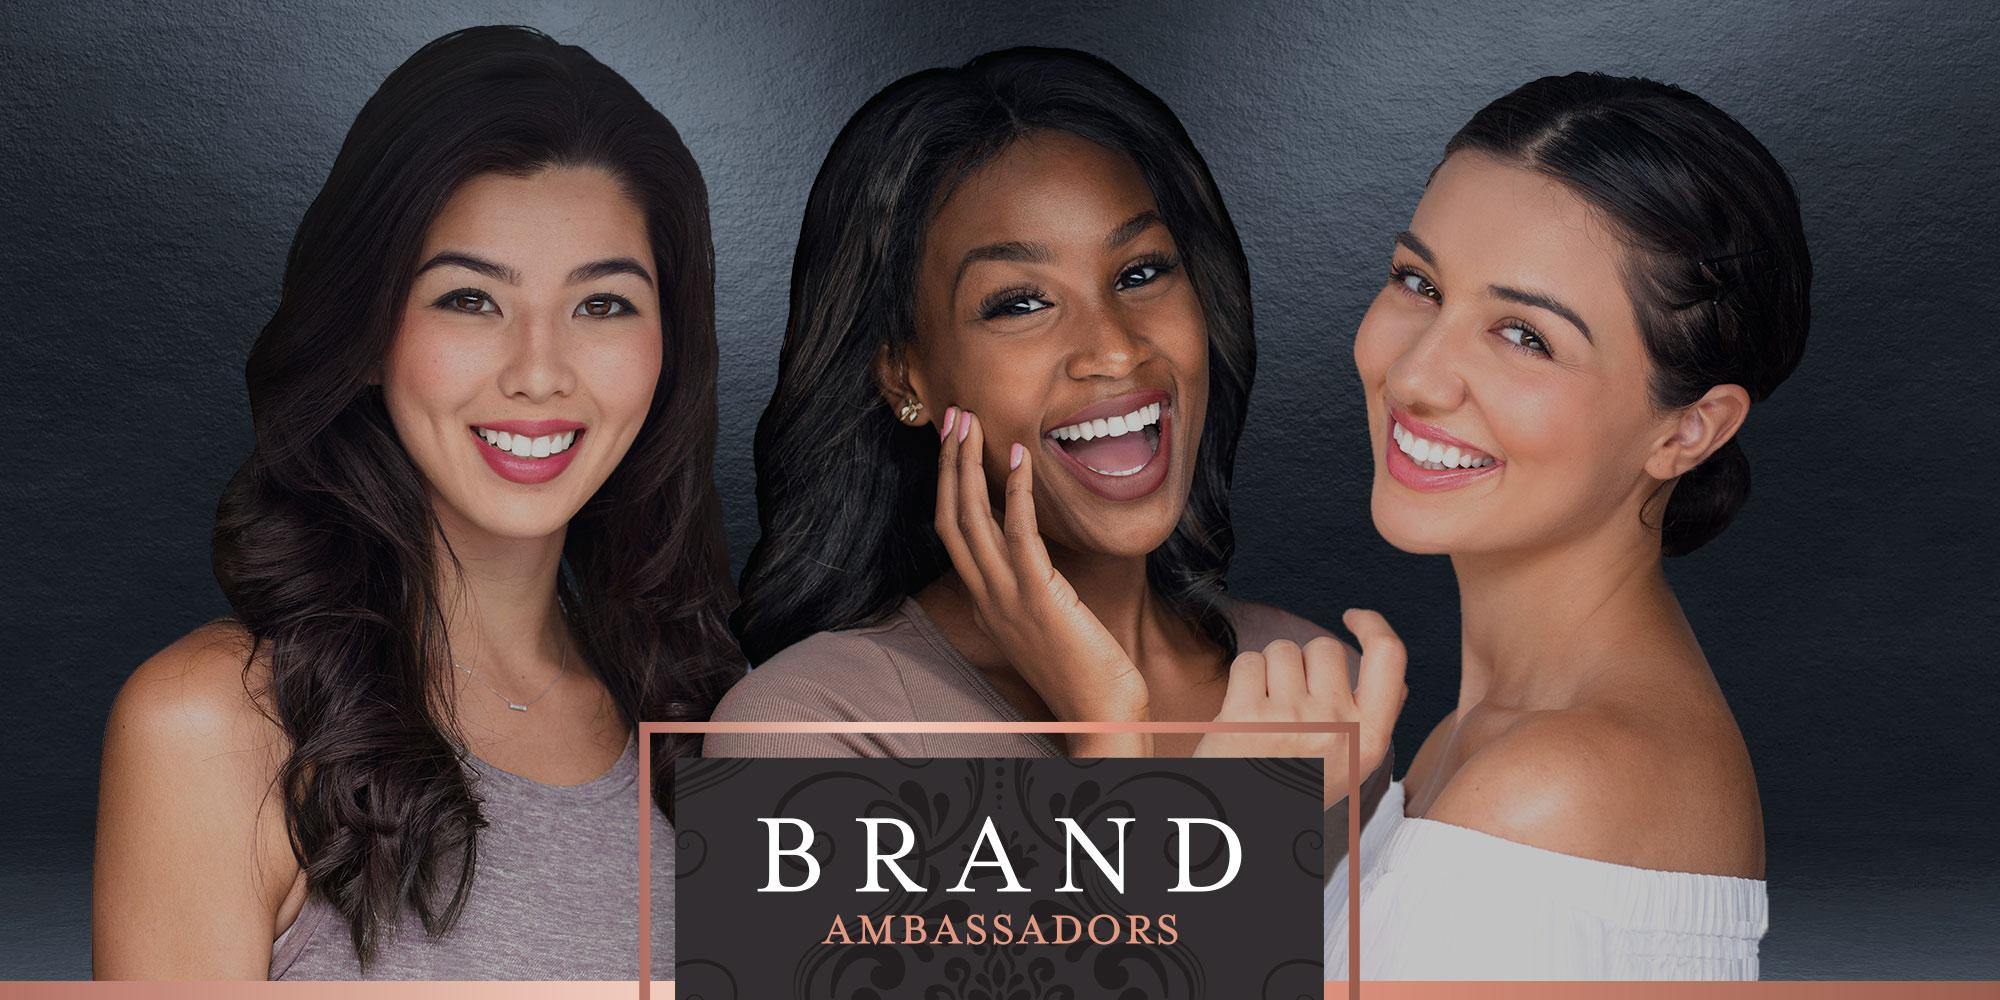 brand ambassadors, corporate identity